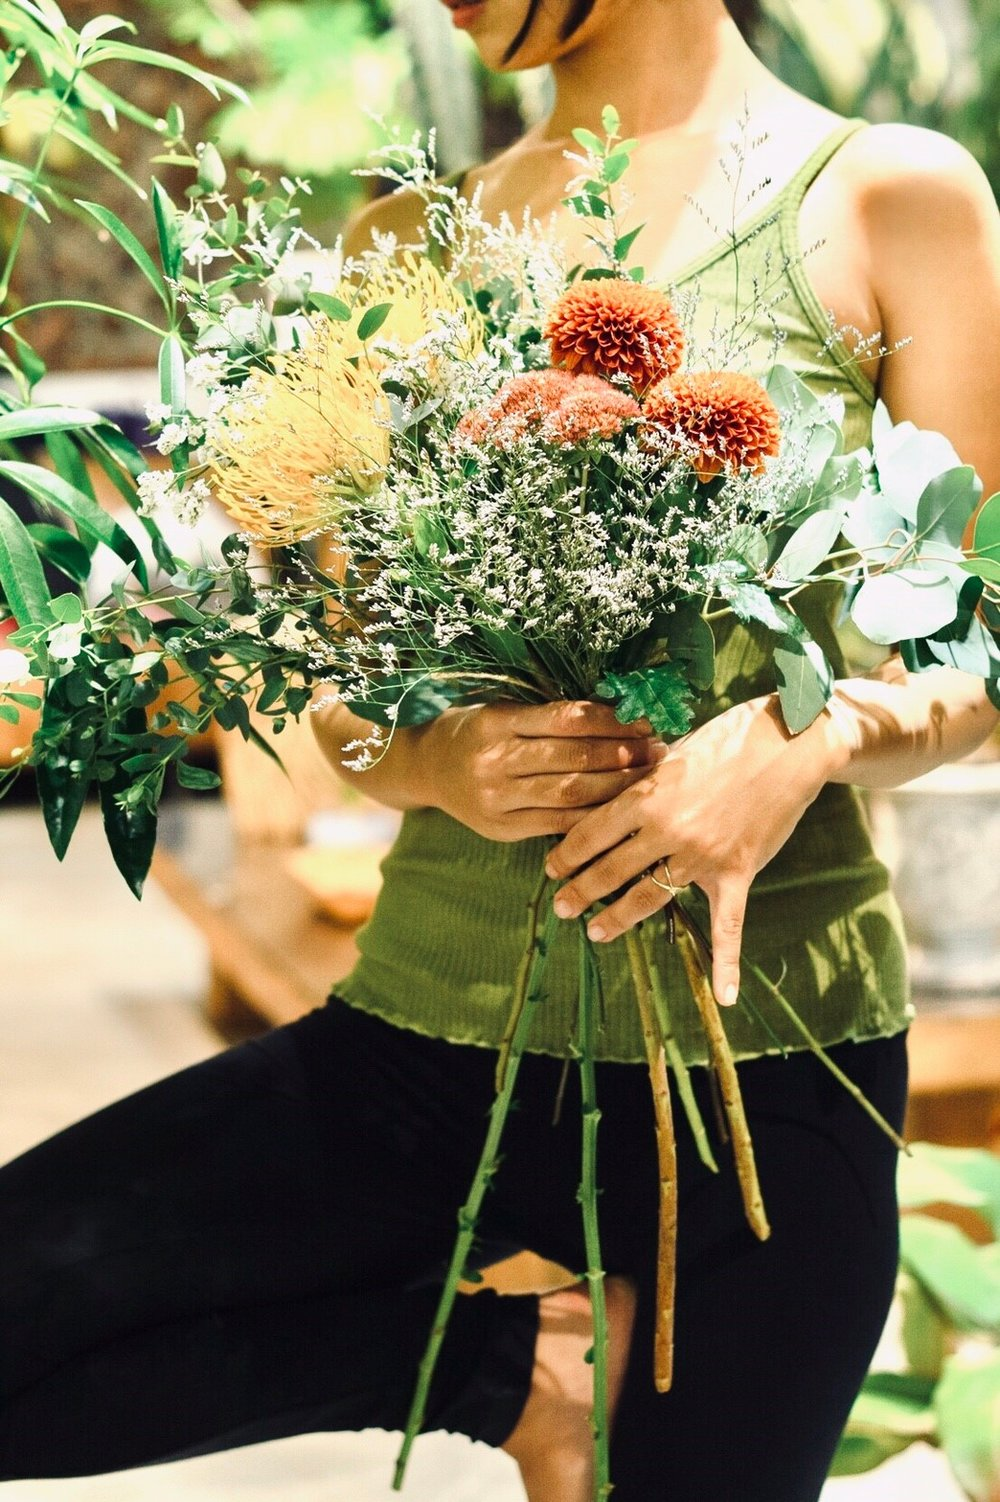 Floral Yoga 11.1_181130_0019.jpg